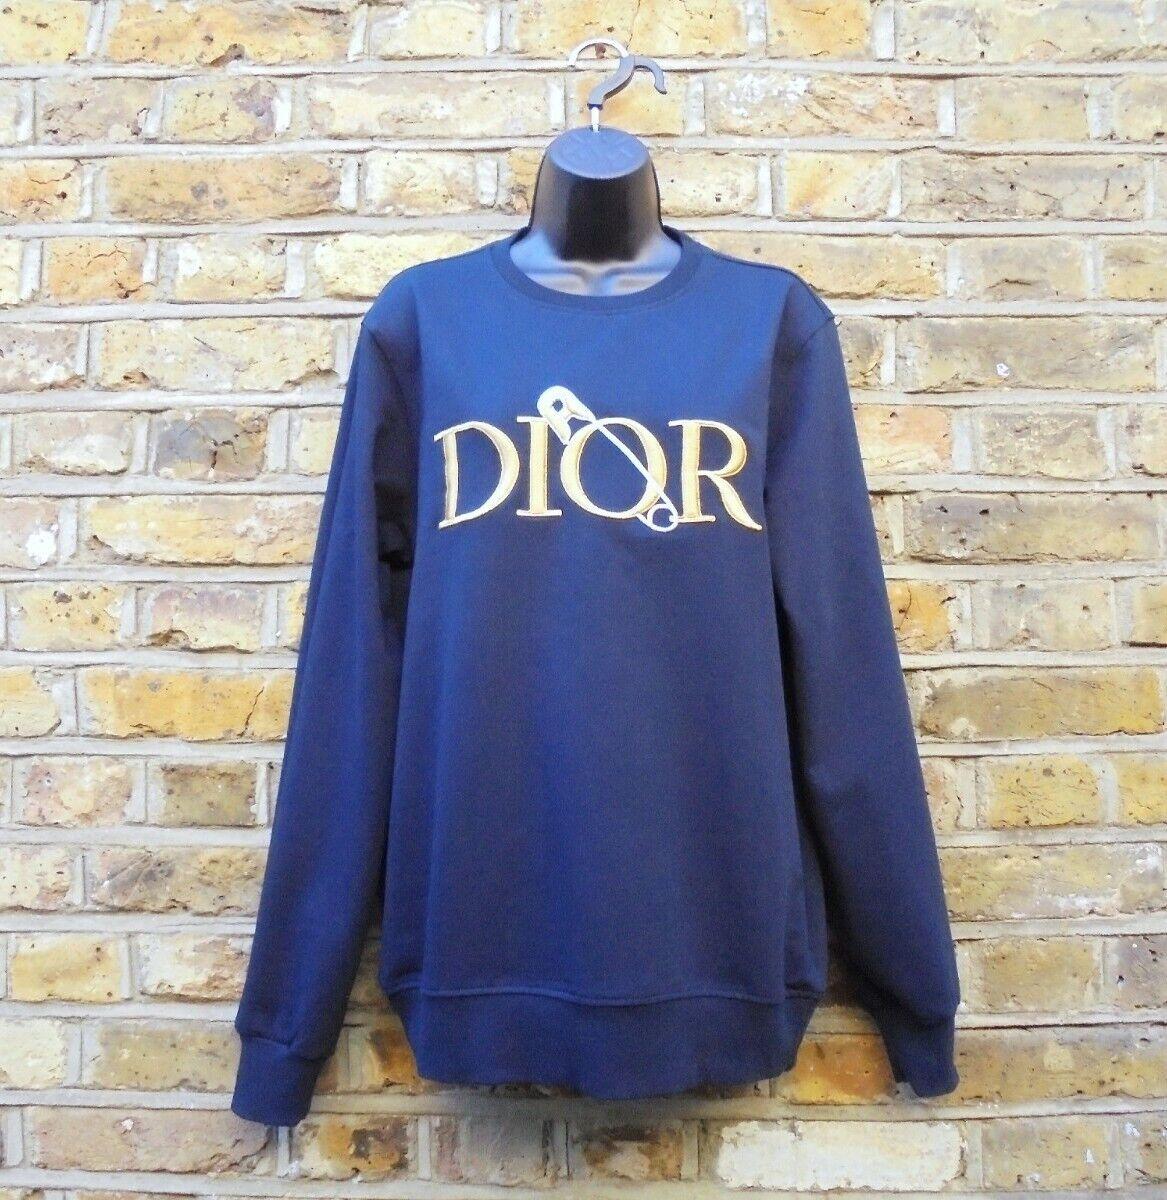 Dior X Judy Blame Unisex Navy Blue Bobbypin Sweatshirt Jumper Size Medium NEW